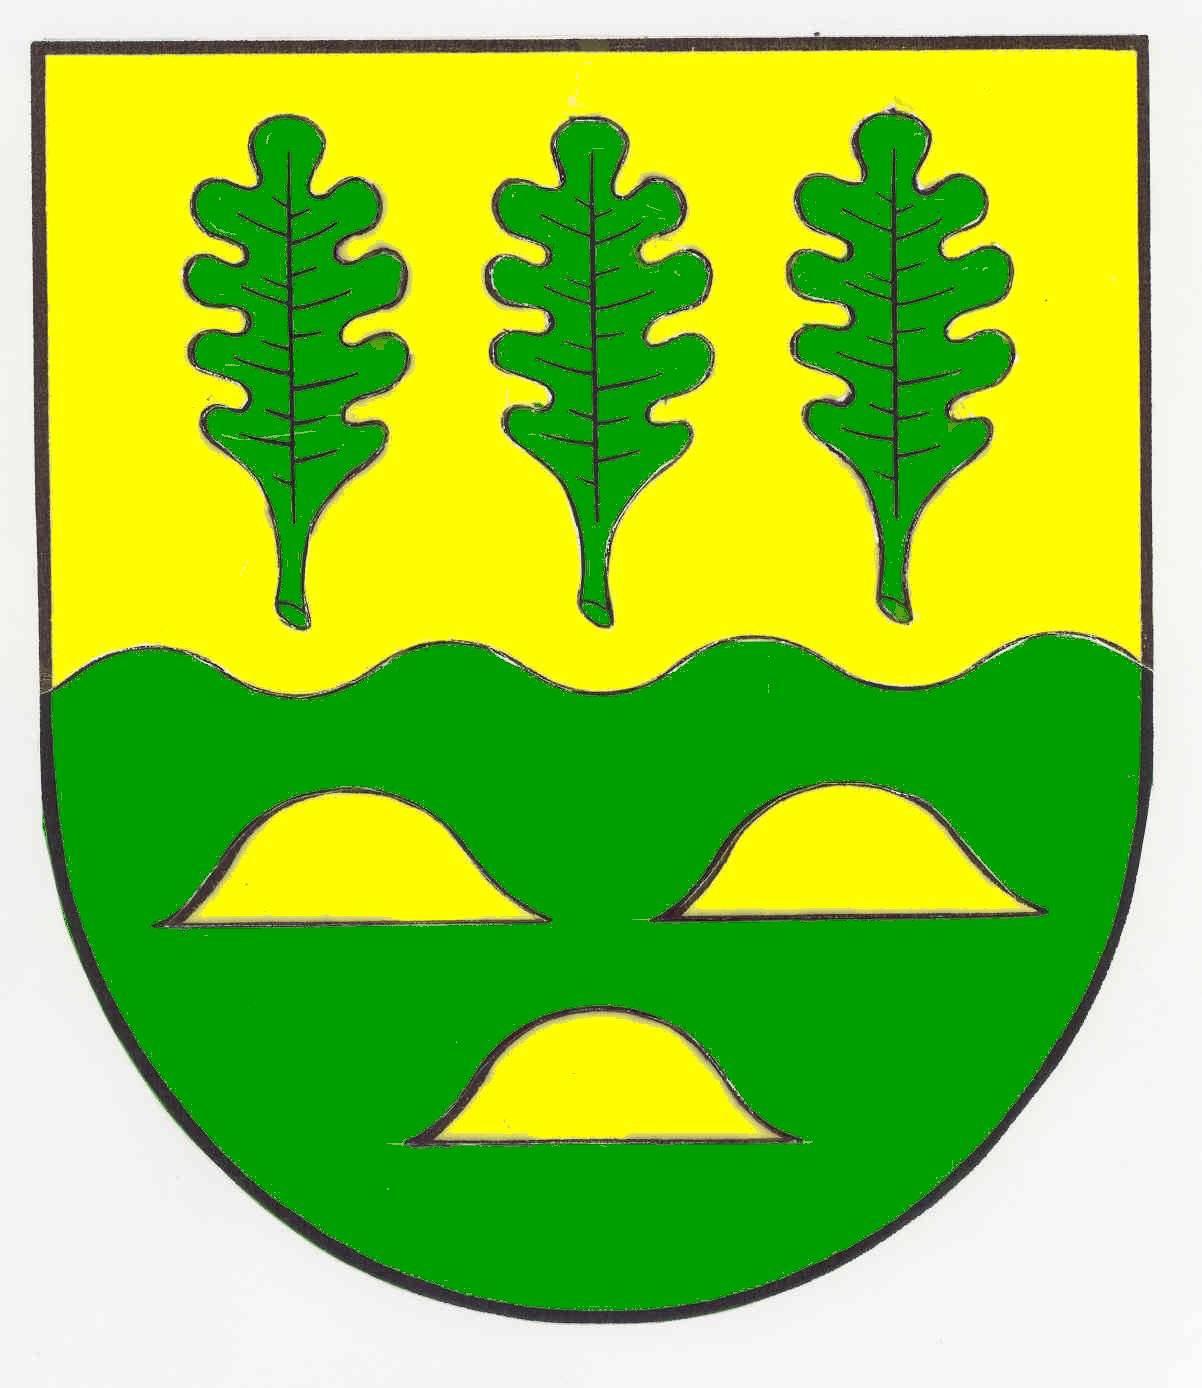 Wappen GemeindeEhndorf, Kreis Rendsburg-Eckernförde